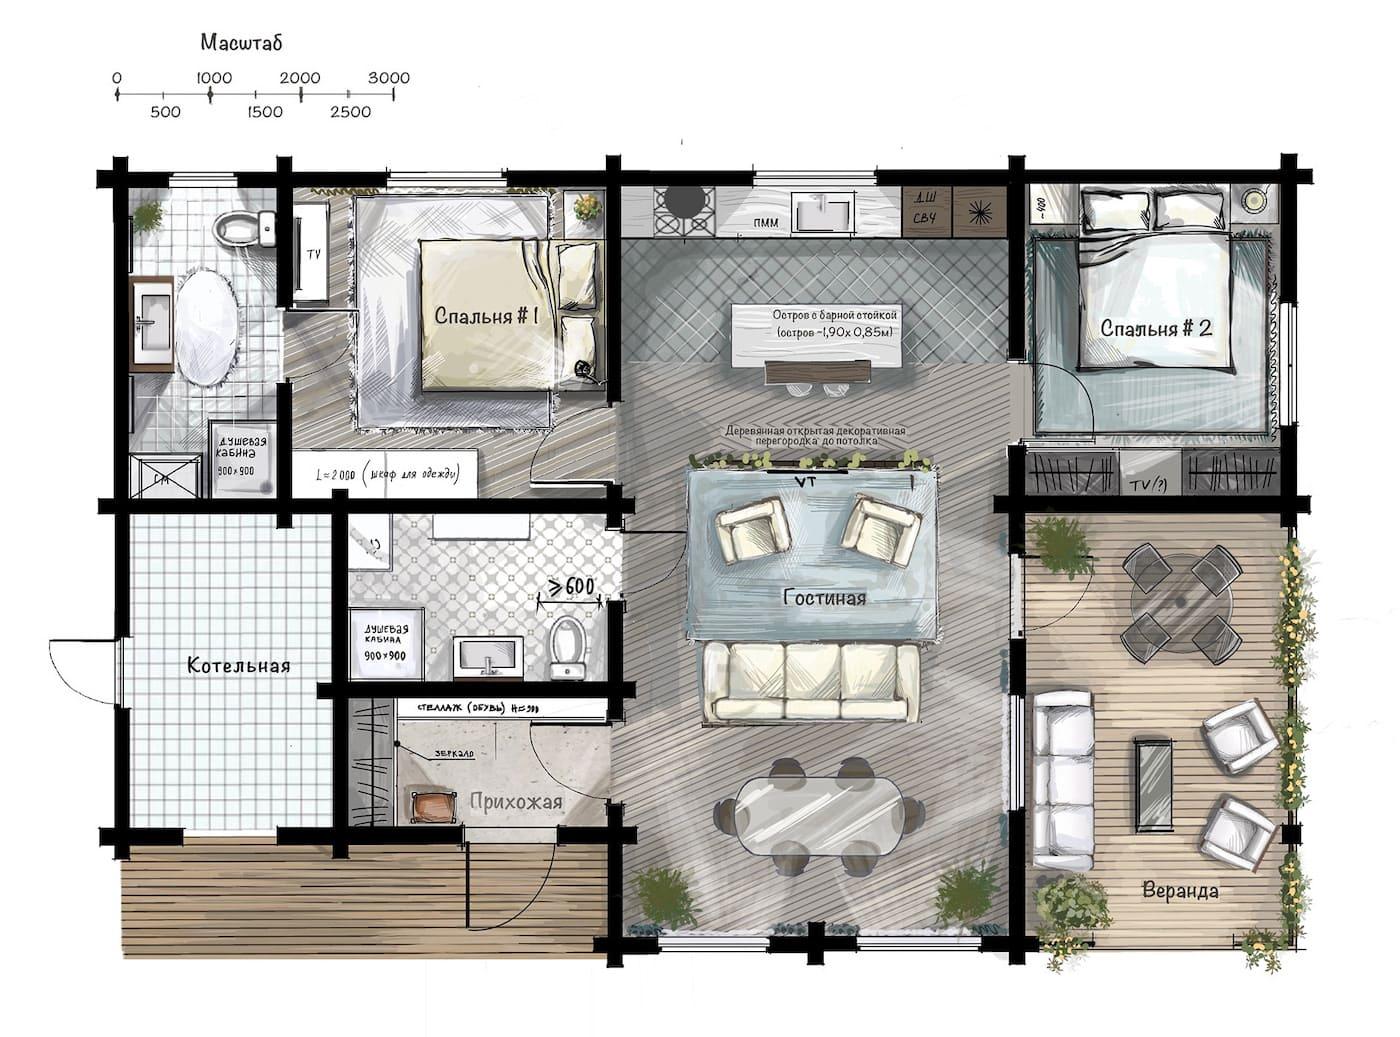 модный дизайн интерьера квартиры фото 59